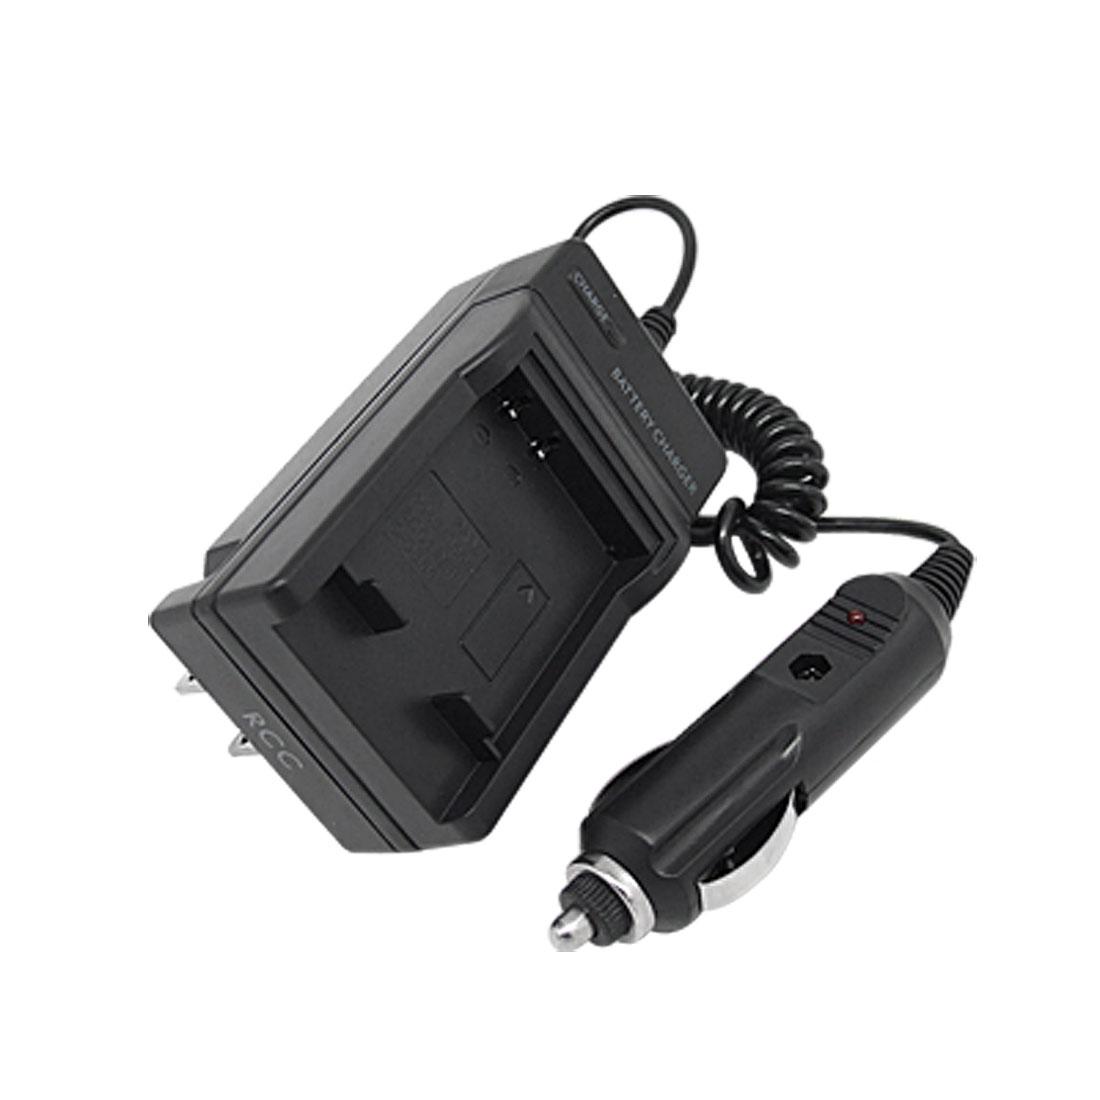 US Plug AC100-240V Battery Charger for Panasonic 005E/BCC12/RICOH-DB-60